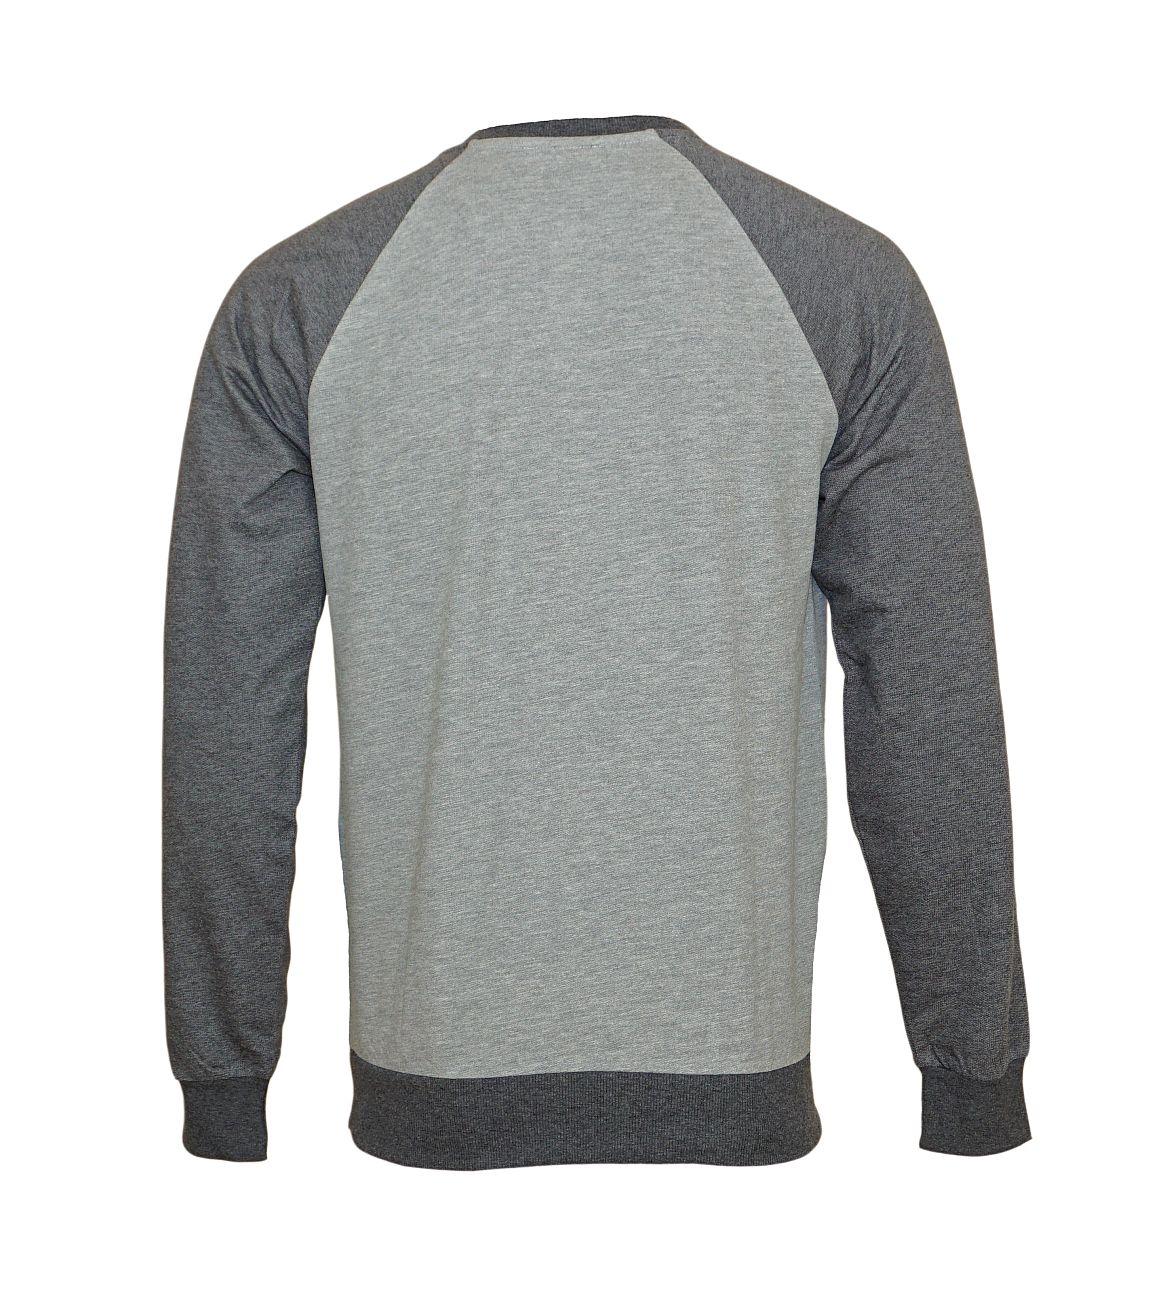 Emporio Armani Pullover Sweater Rundhals 111062 8A566 01548 GRIGIO MELANGE WX18-EAS